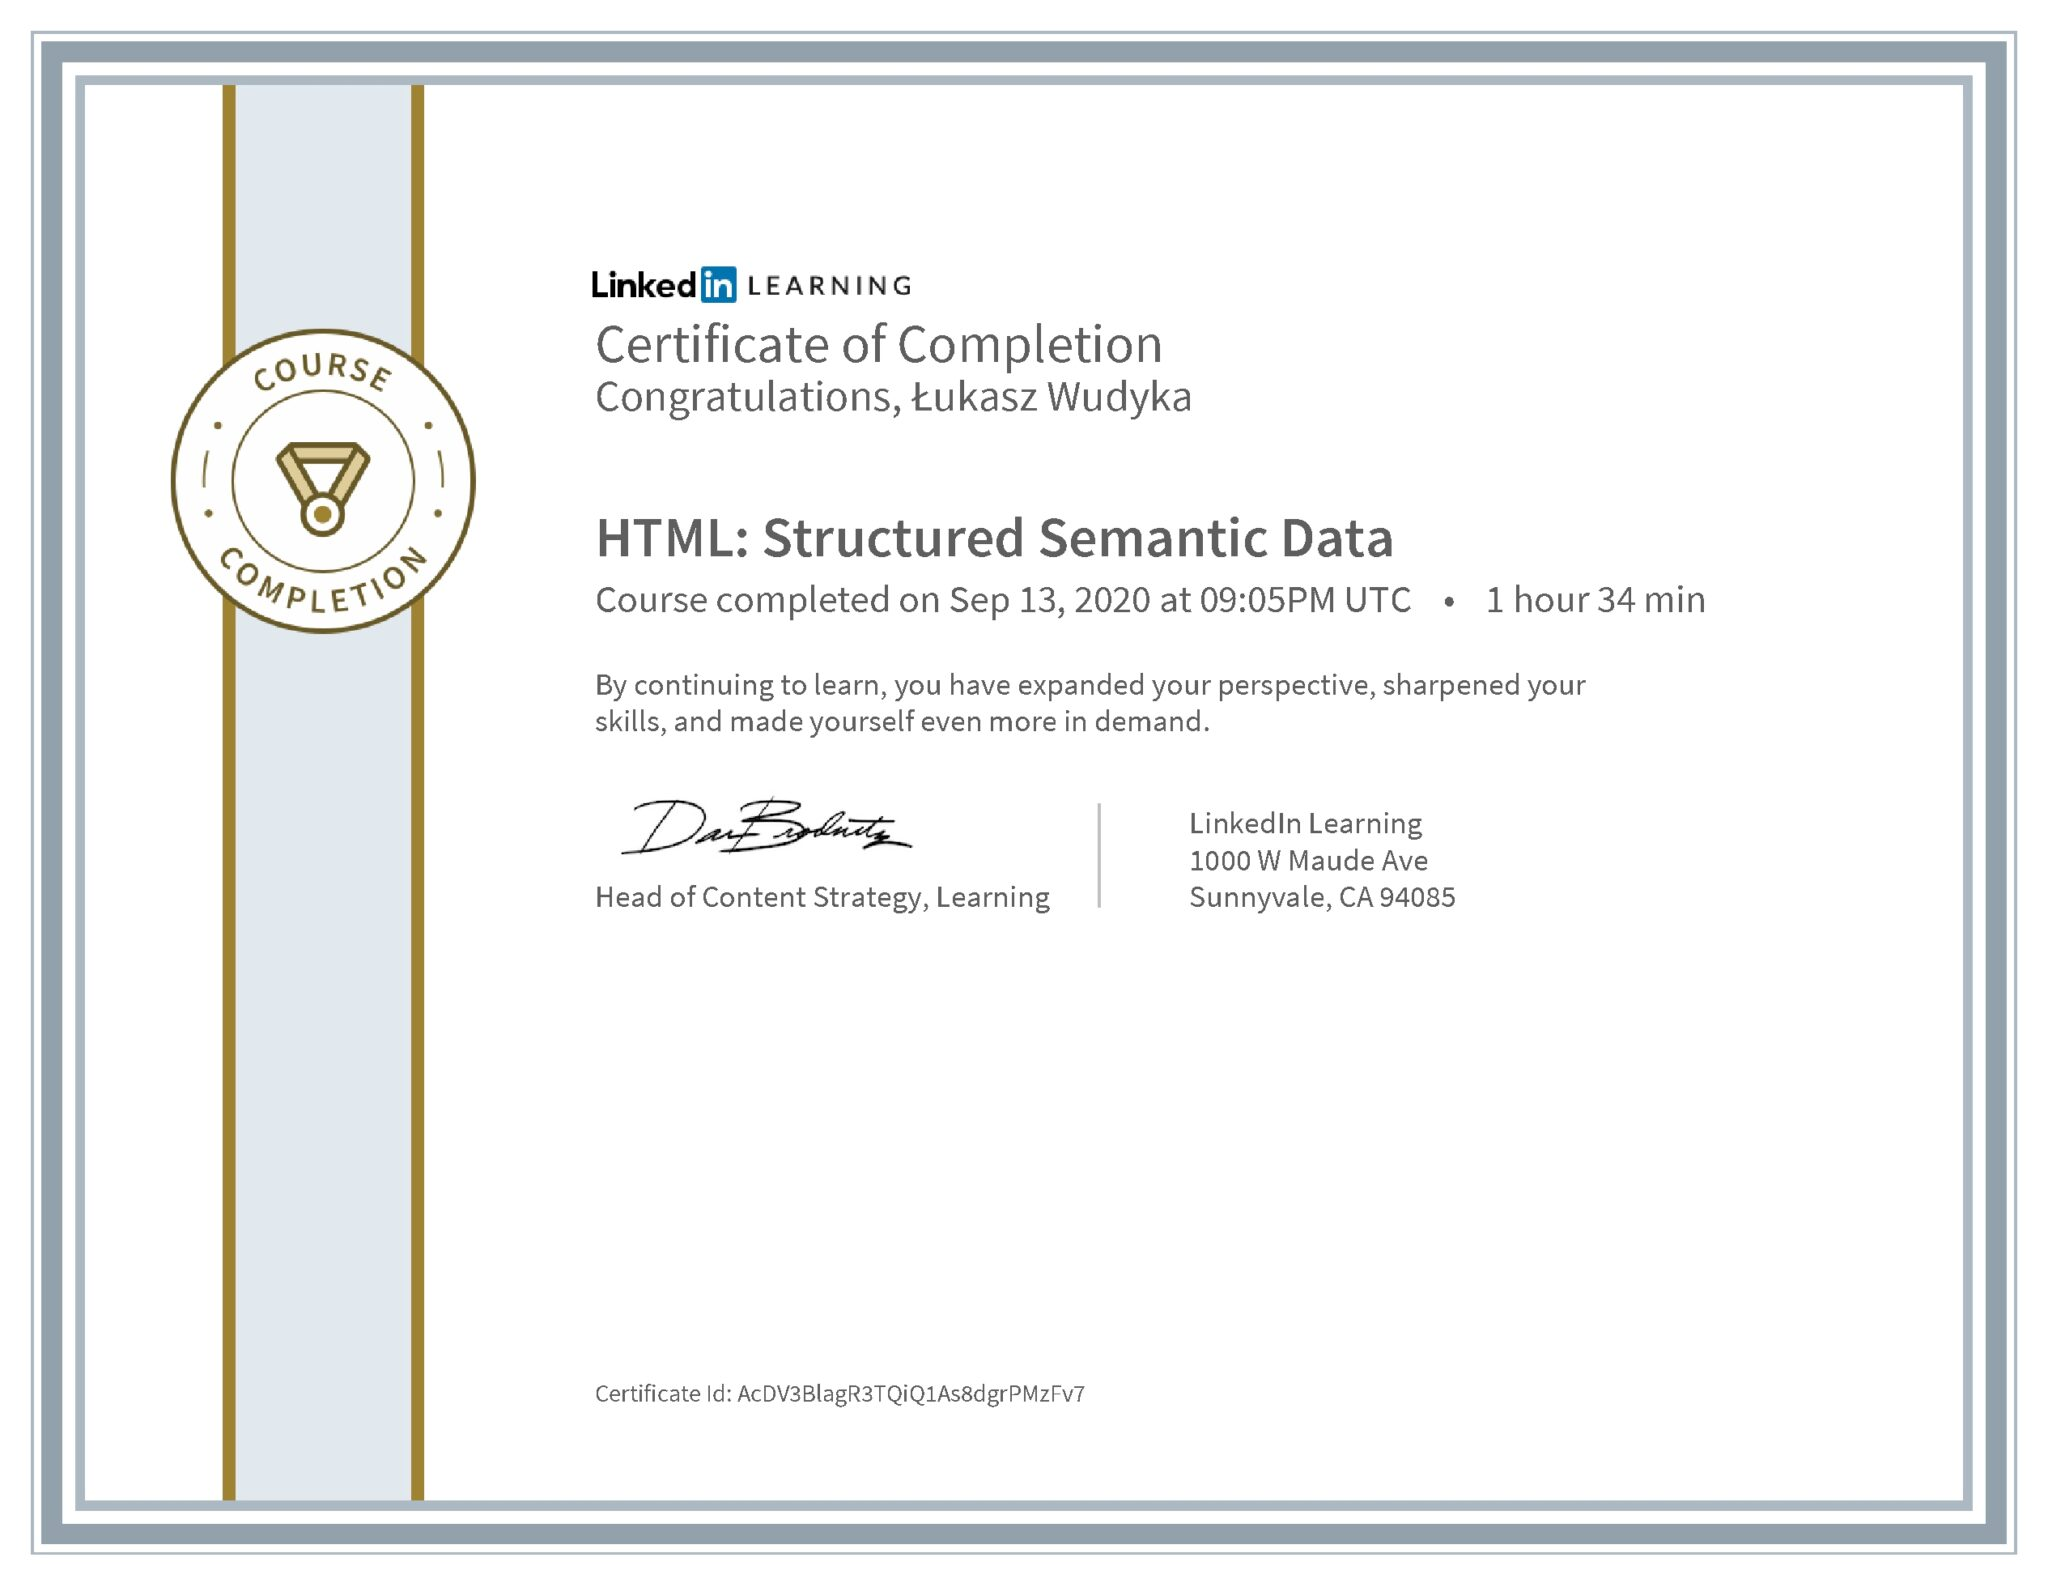 Łukasz Wudyka certyfikat LinkedIn HTML: Structured Semantic Data